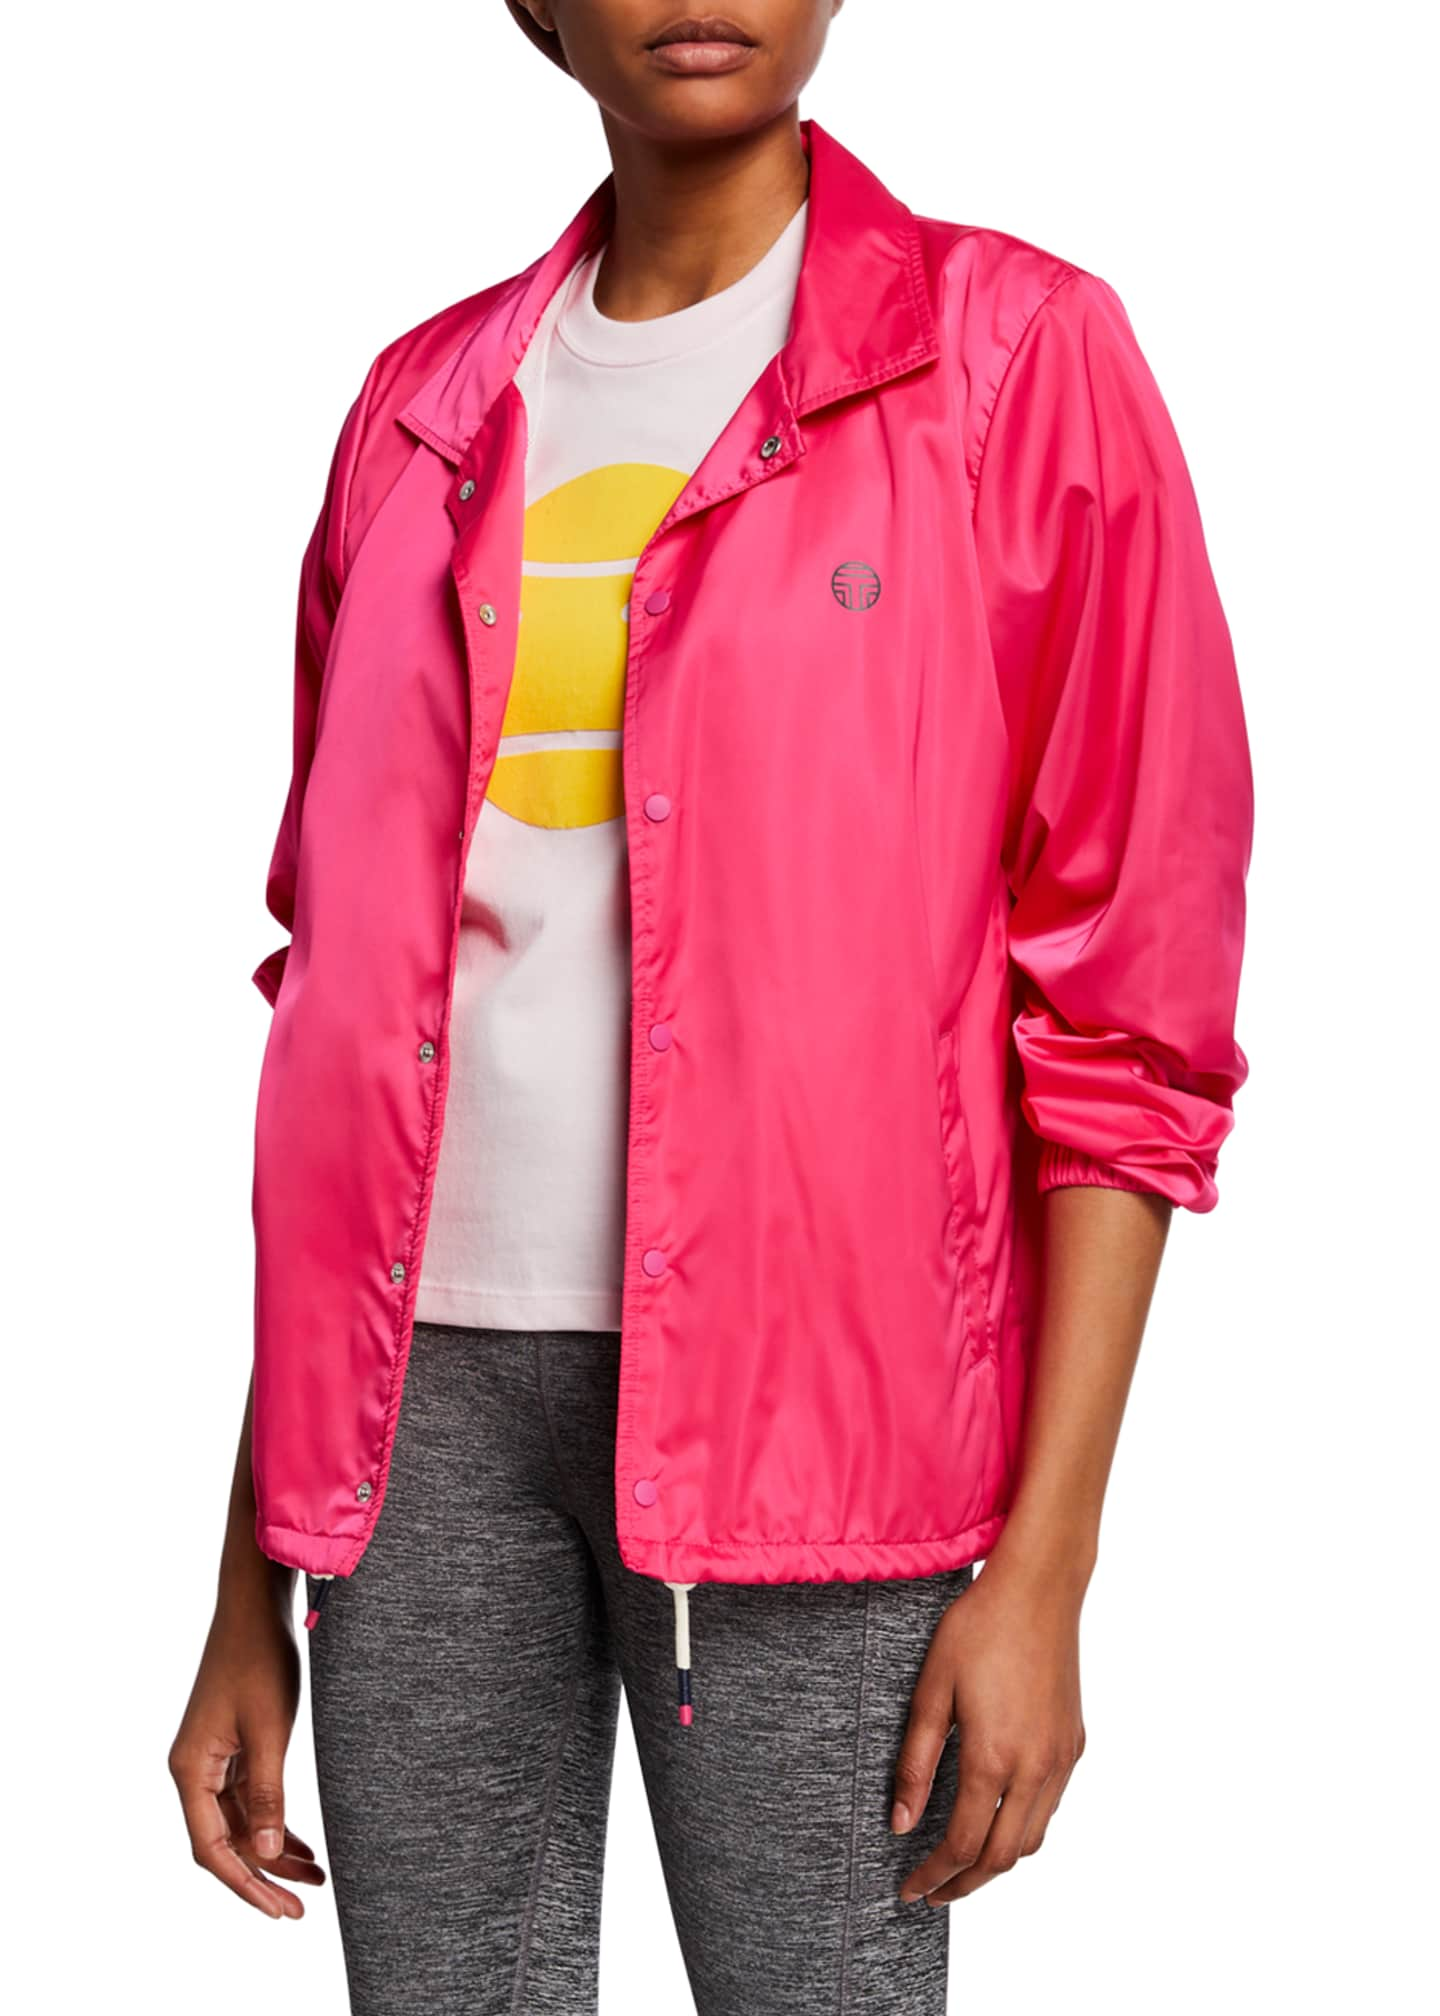 Tory Sport GoodSport Satin Warm-Up Jacket